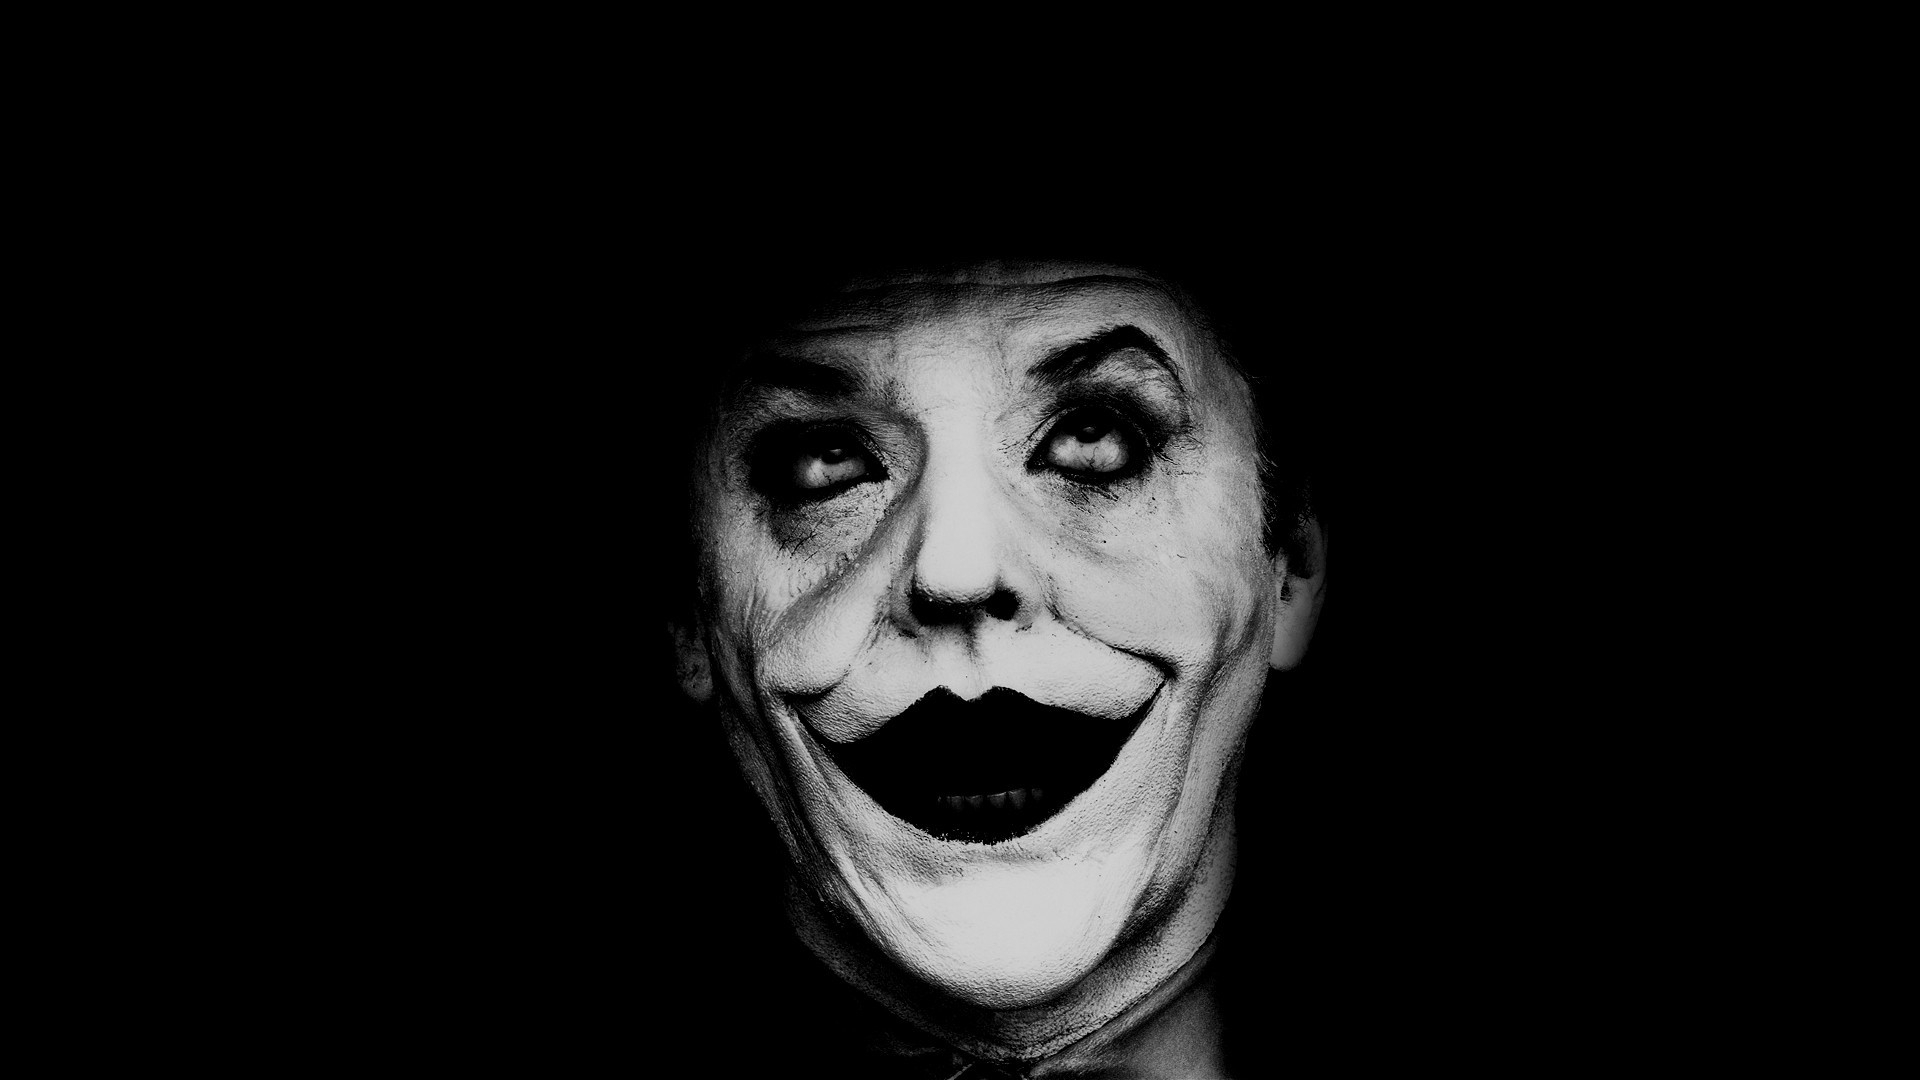 batman movies the joker jack nicholson wallpaper | allwallpaper.in